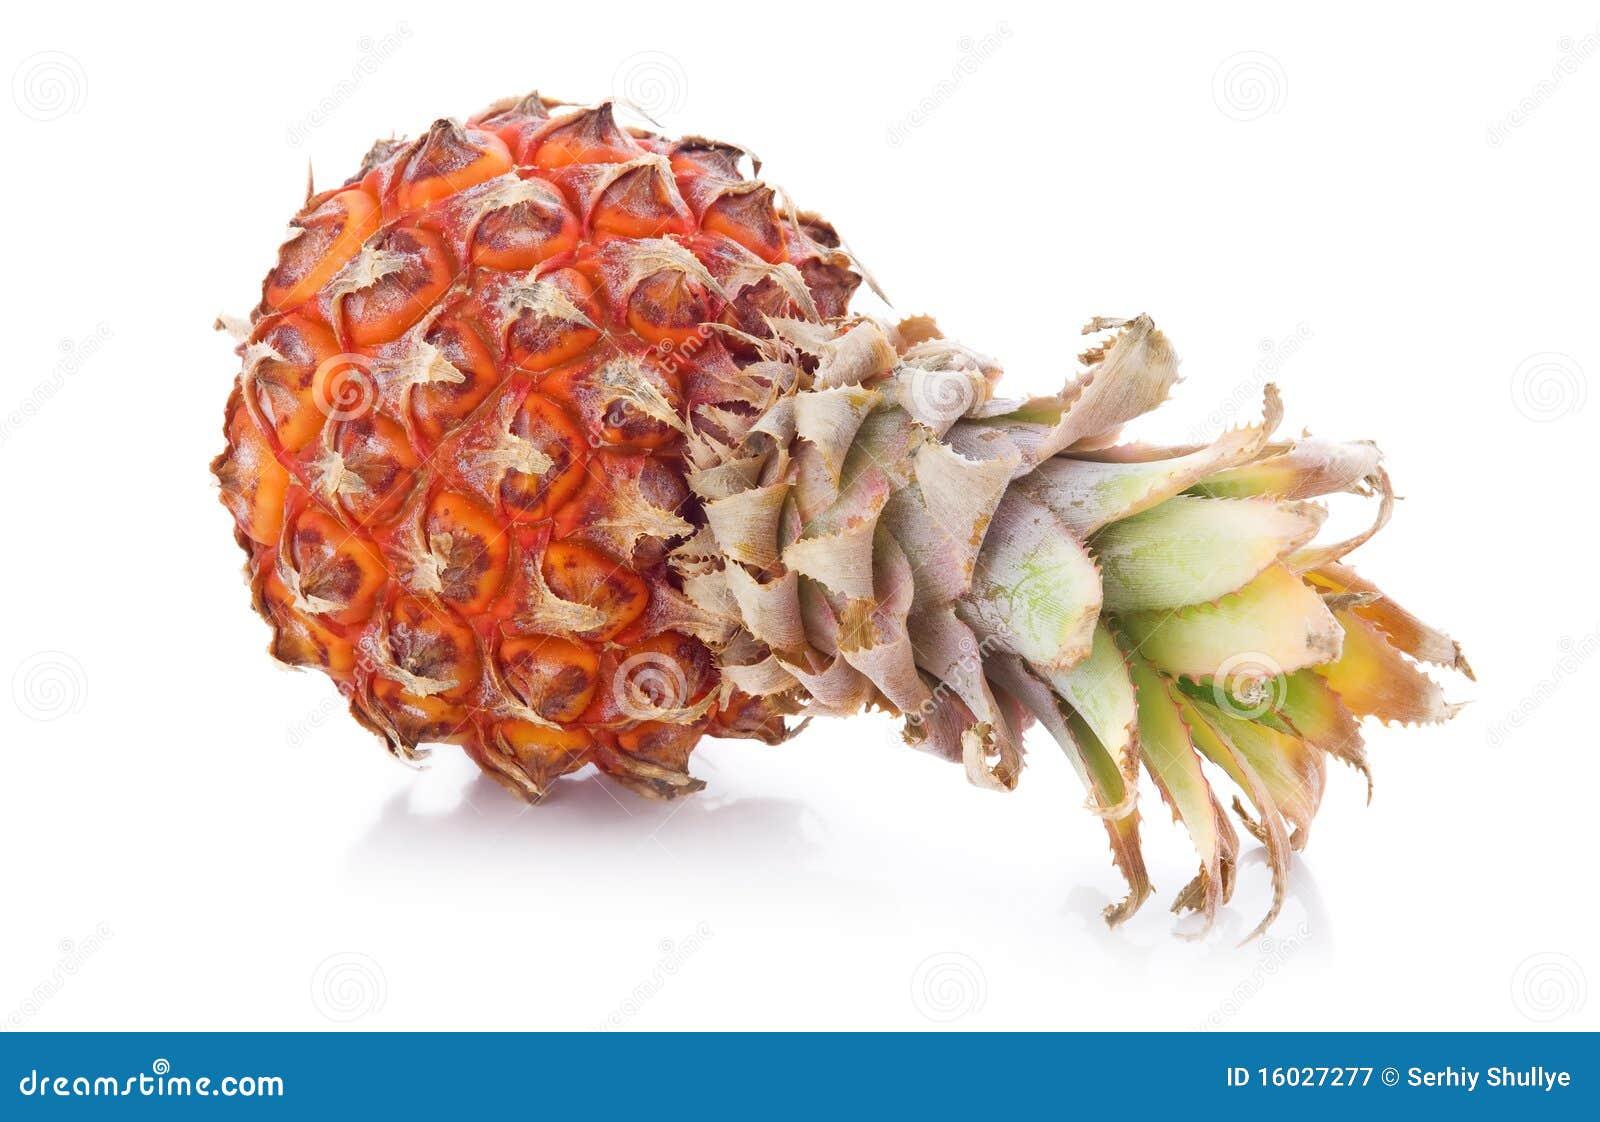 how to make a pineapple ripe